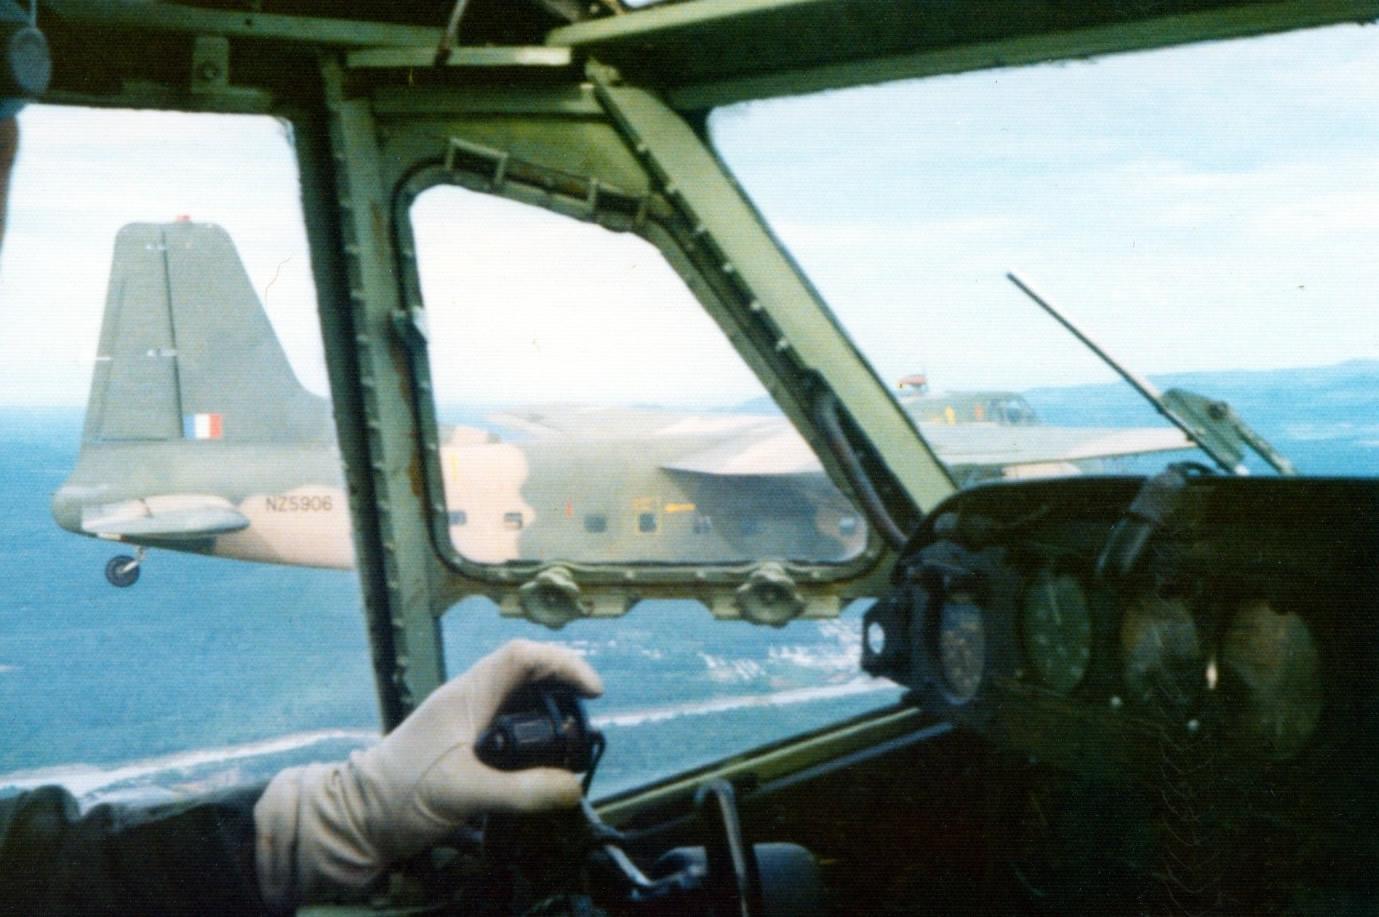 Flt Lt Keith Skilling in Bristol Freighter NZ5912 formates on NZ5906 flown by Flt Lt Den Monti 9 Nov 1973 – photo by Jim Barclay